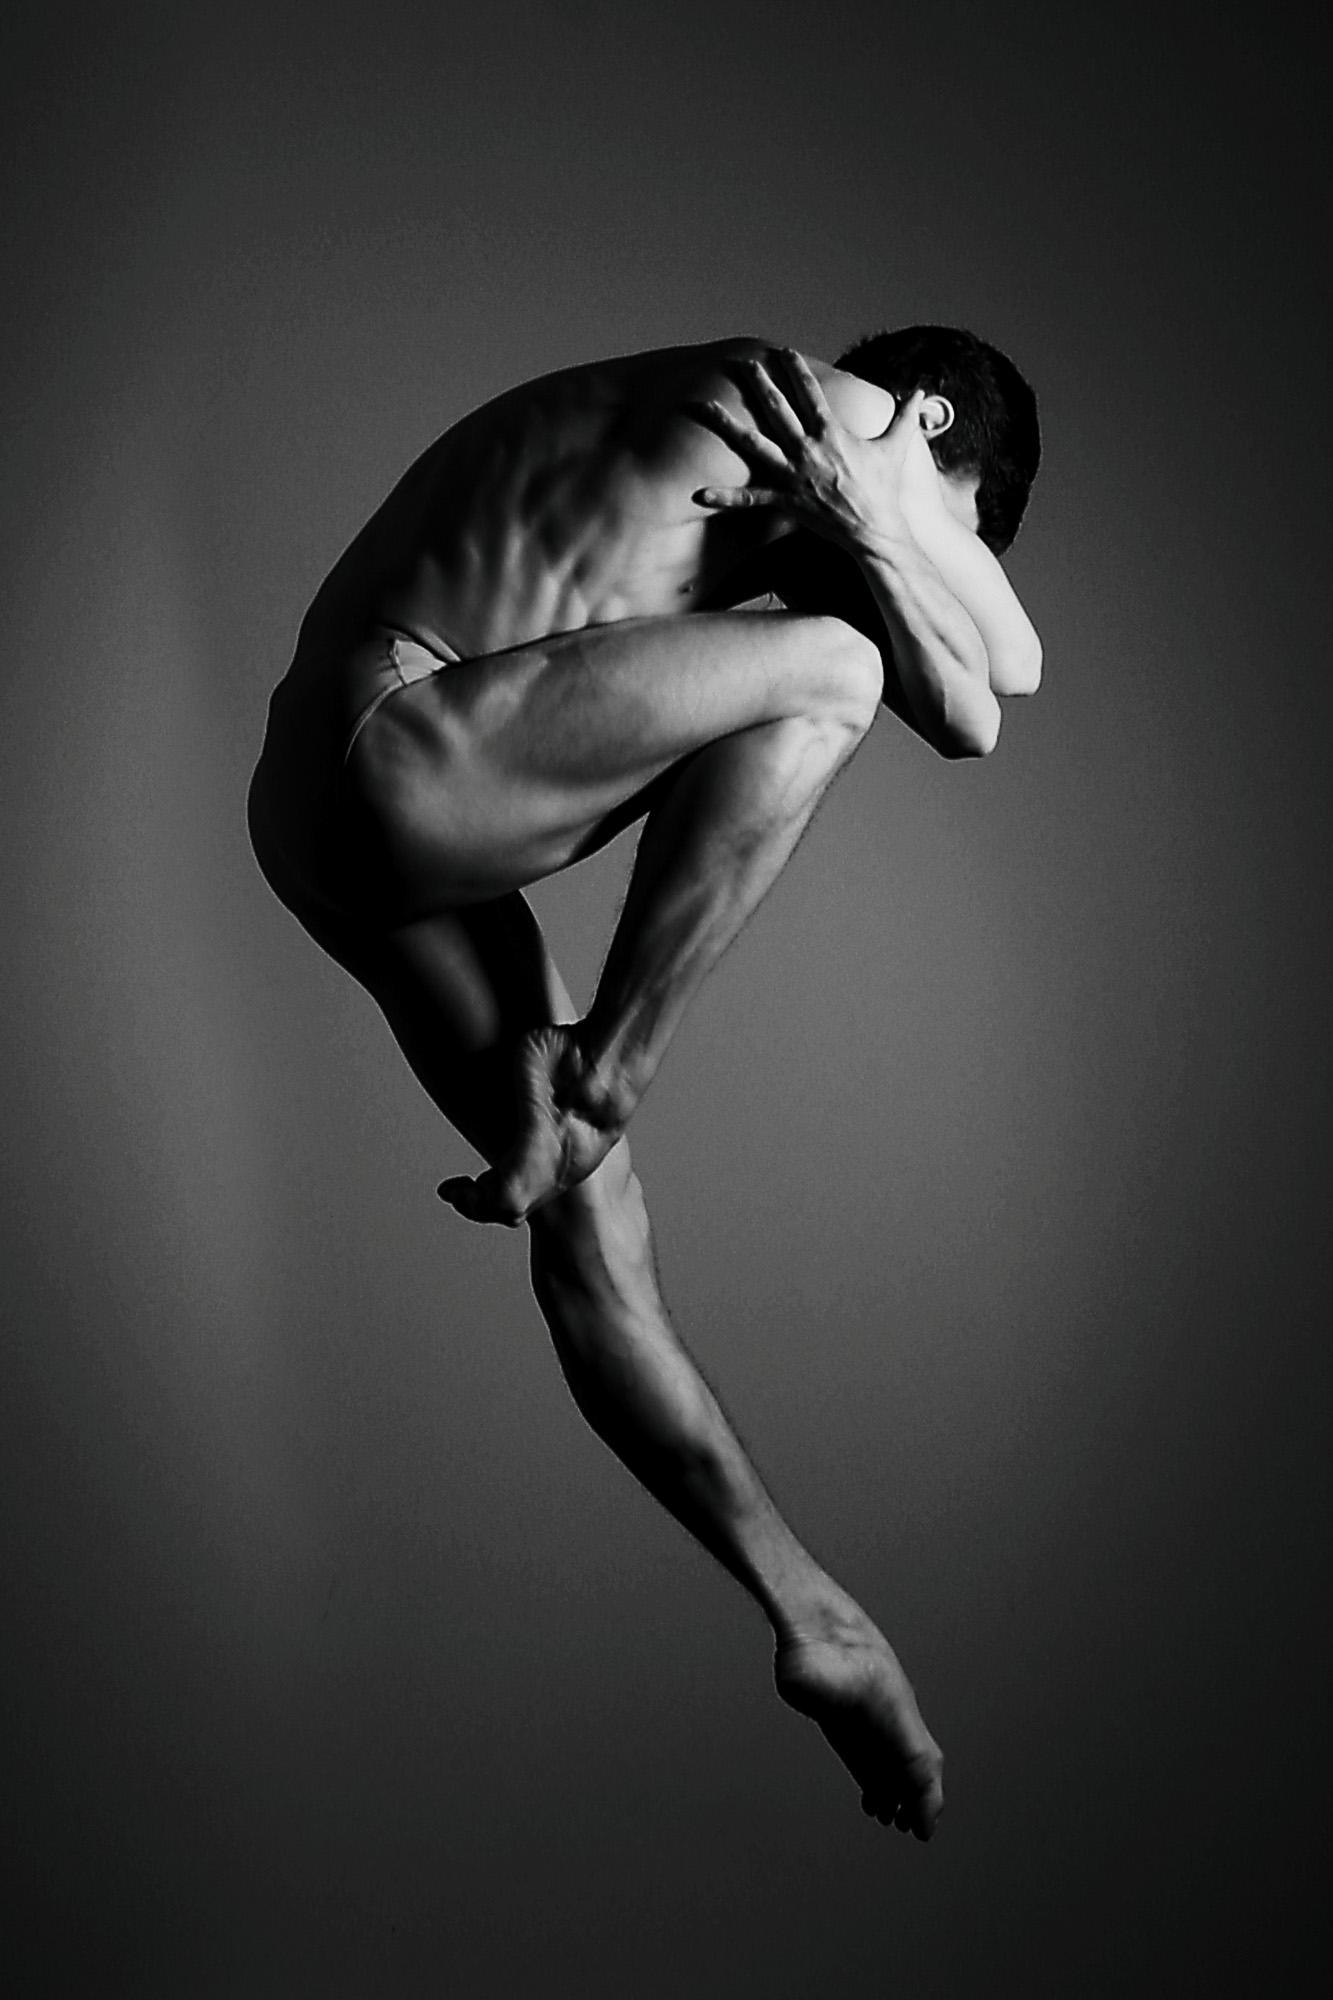 CURTISBROWNPHOTOGRAPHY_DANCE_012.JPG